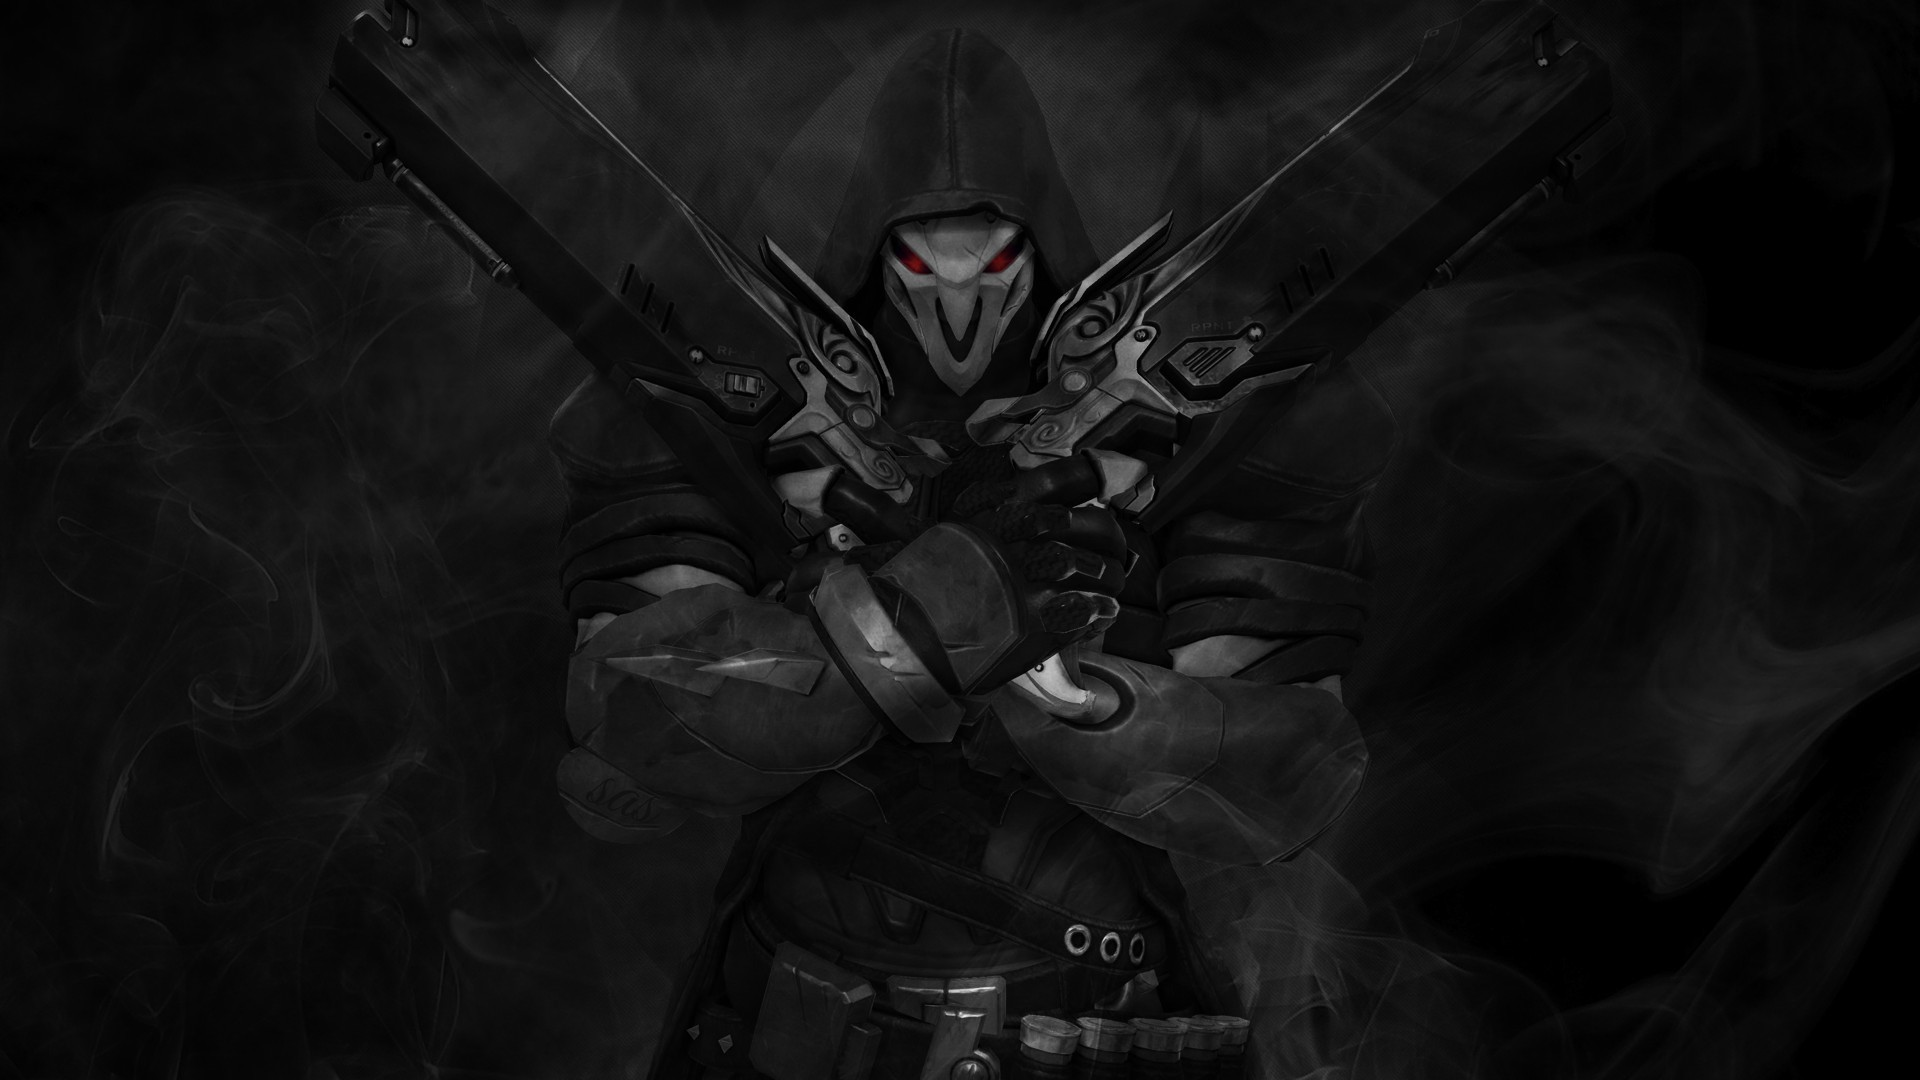 The Grim Reaper Wallpaper (62+ images)